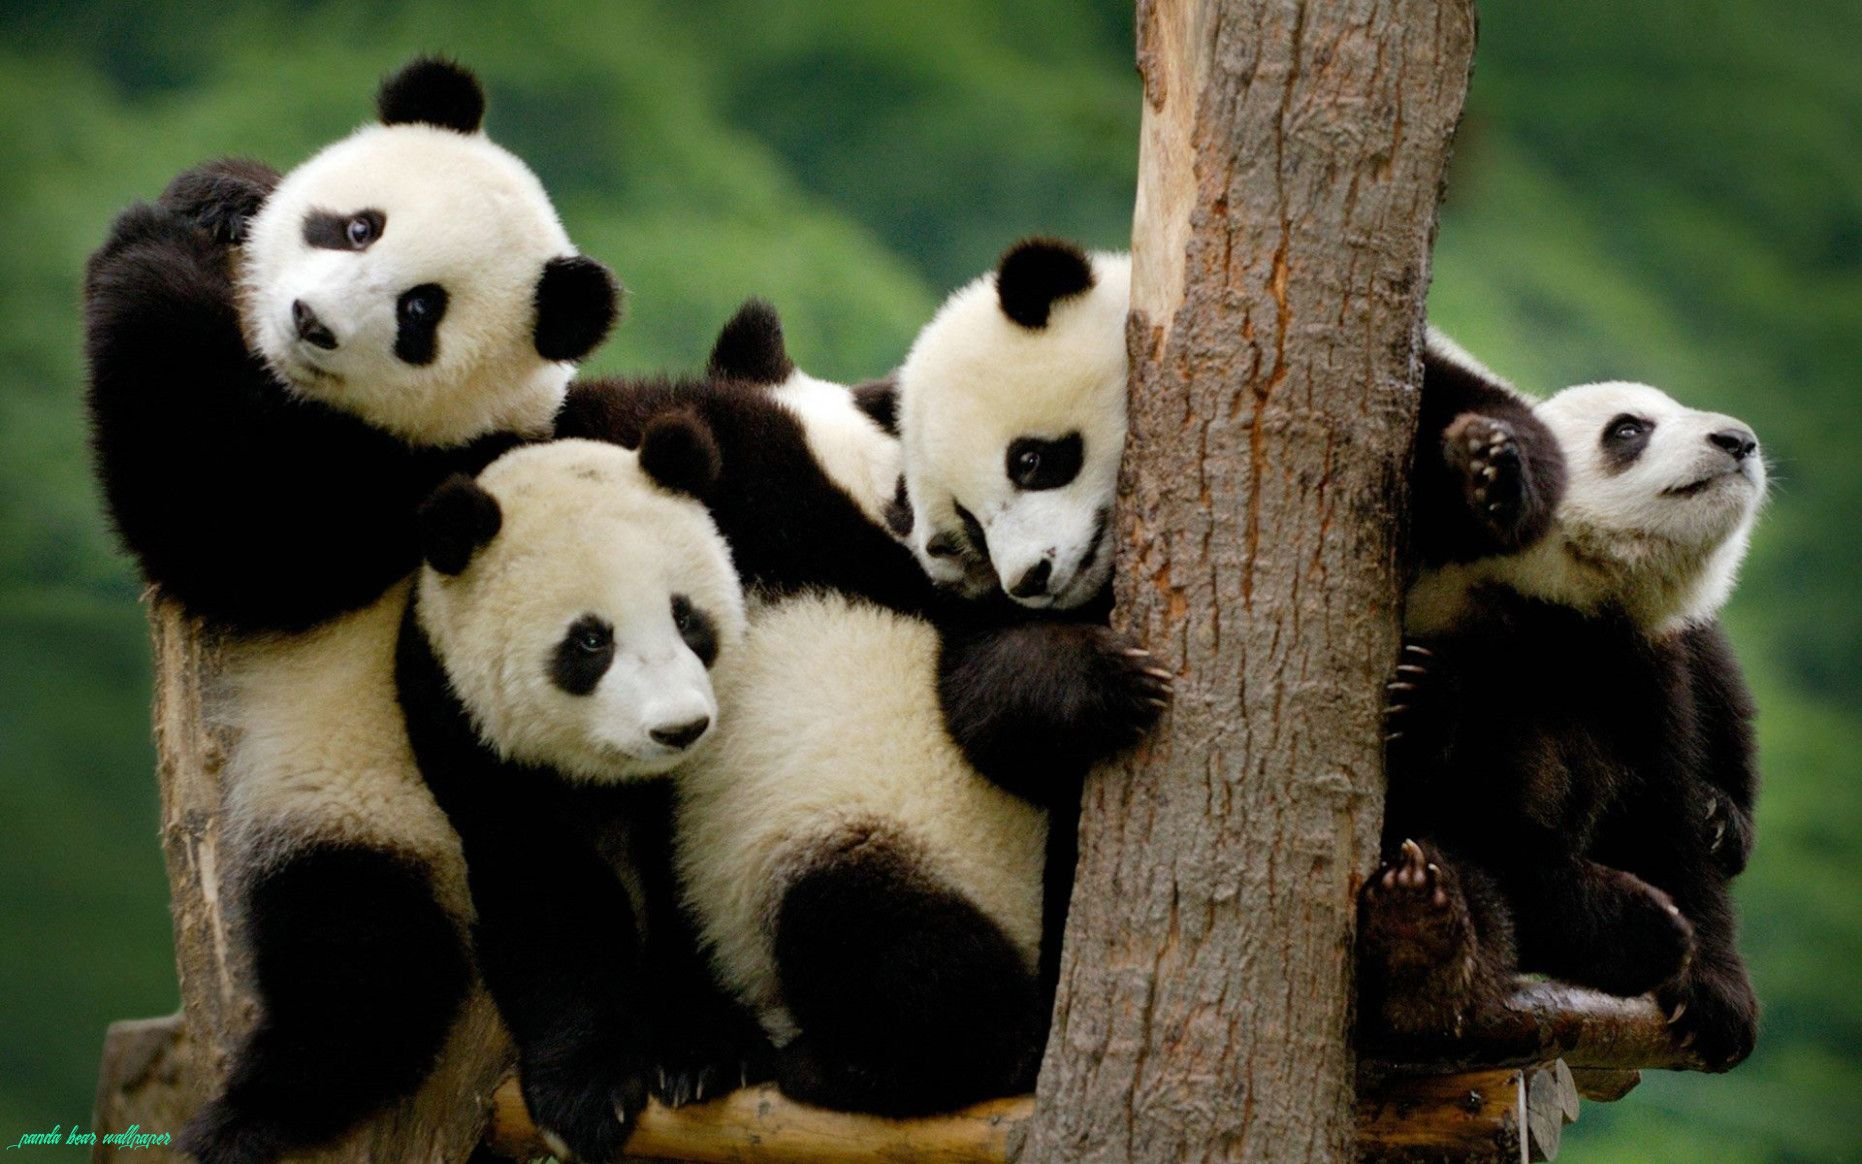 11 Common Mistakes Everyone Makes In Panda Bear Wallpaper Panda Bear Wallpaper In 2020 Panda Funny Panda Bears Wallpaper Panda Wallpapers